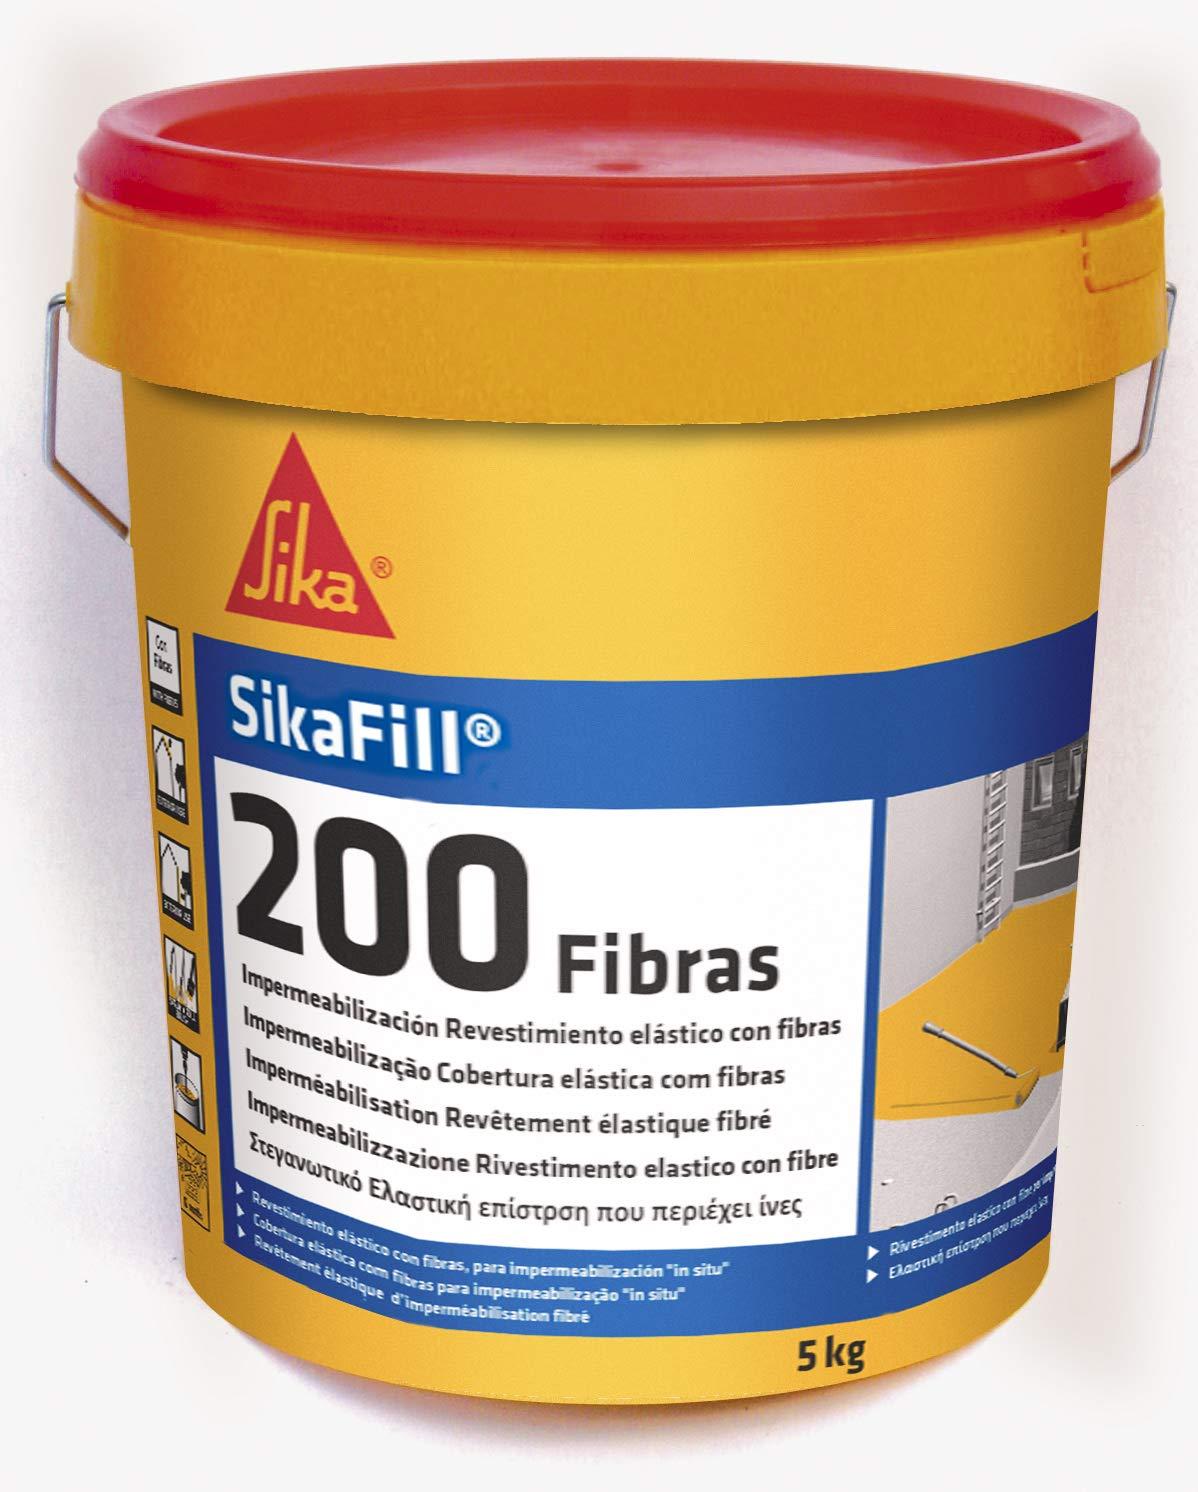 Sikafill-200 fibras, Pintura elástica con fibras para impermeabilización, Gris, 5kg product image